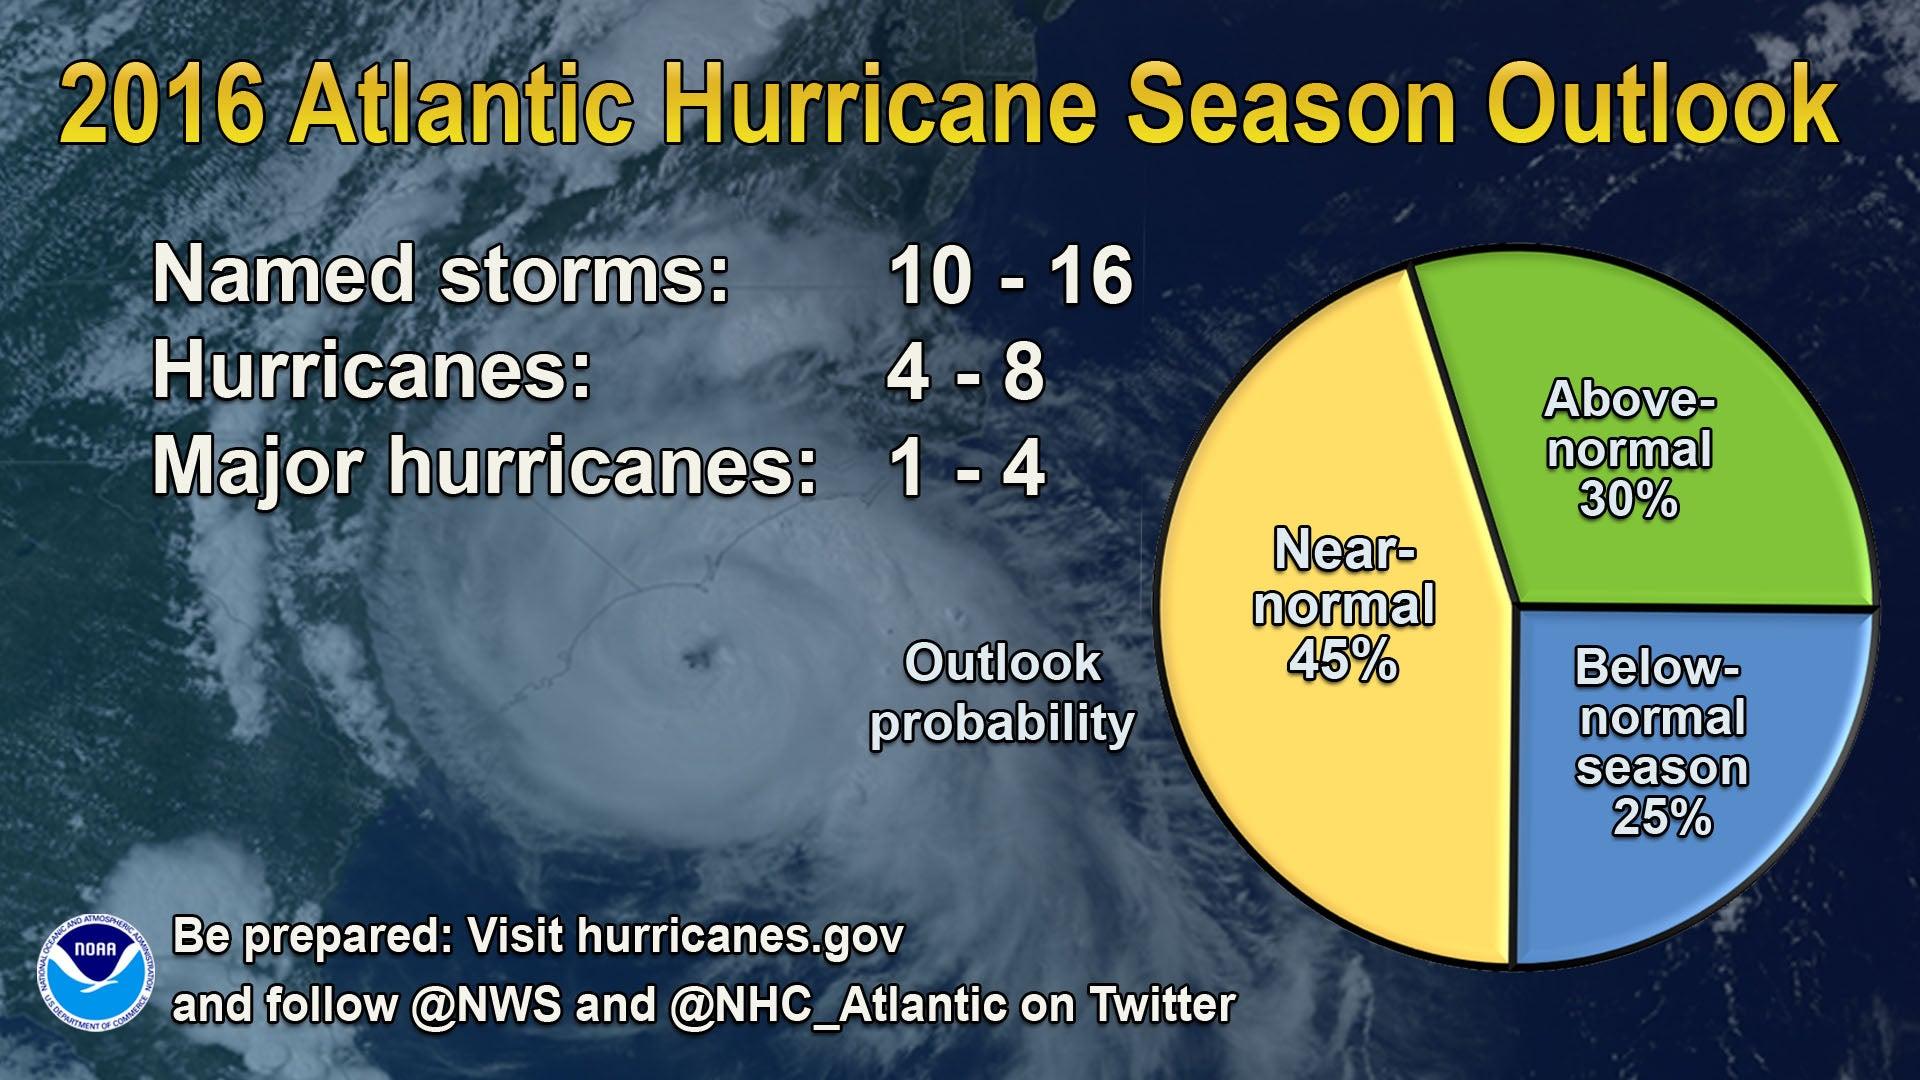 2016 Hurricane Season May Be The End Of Hurricane Lull